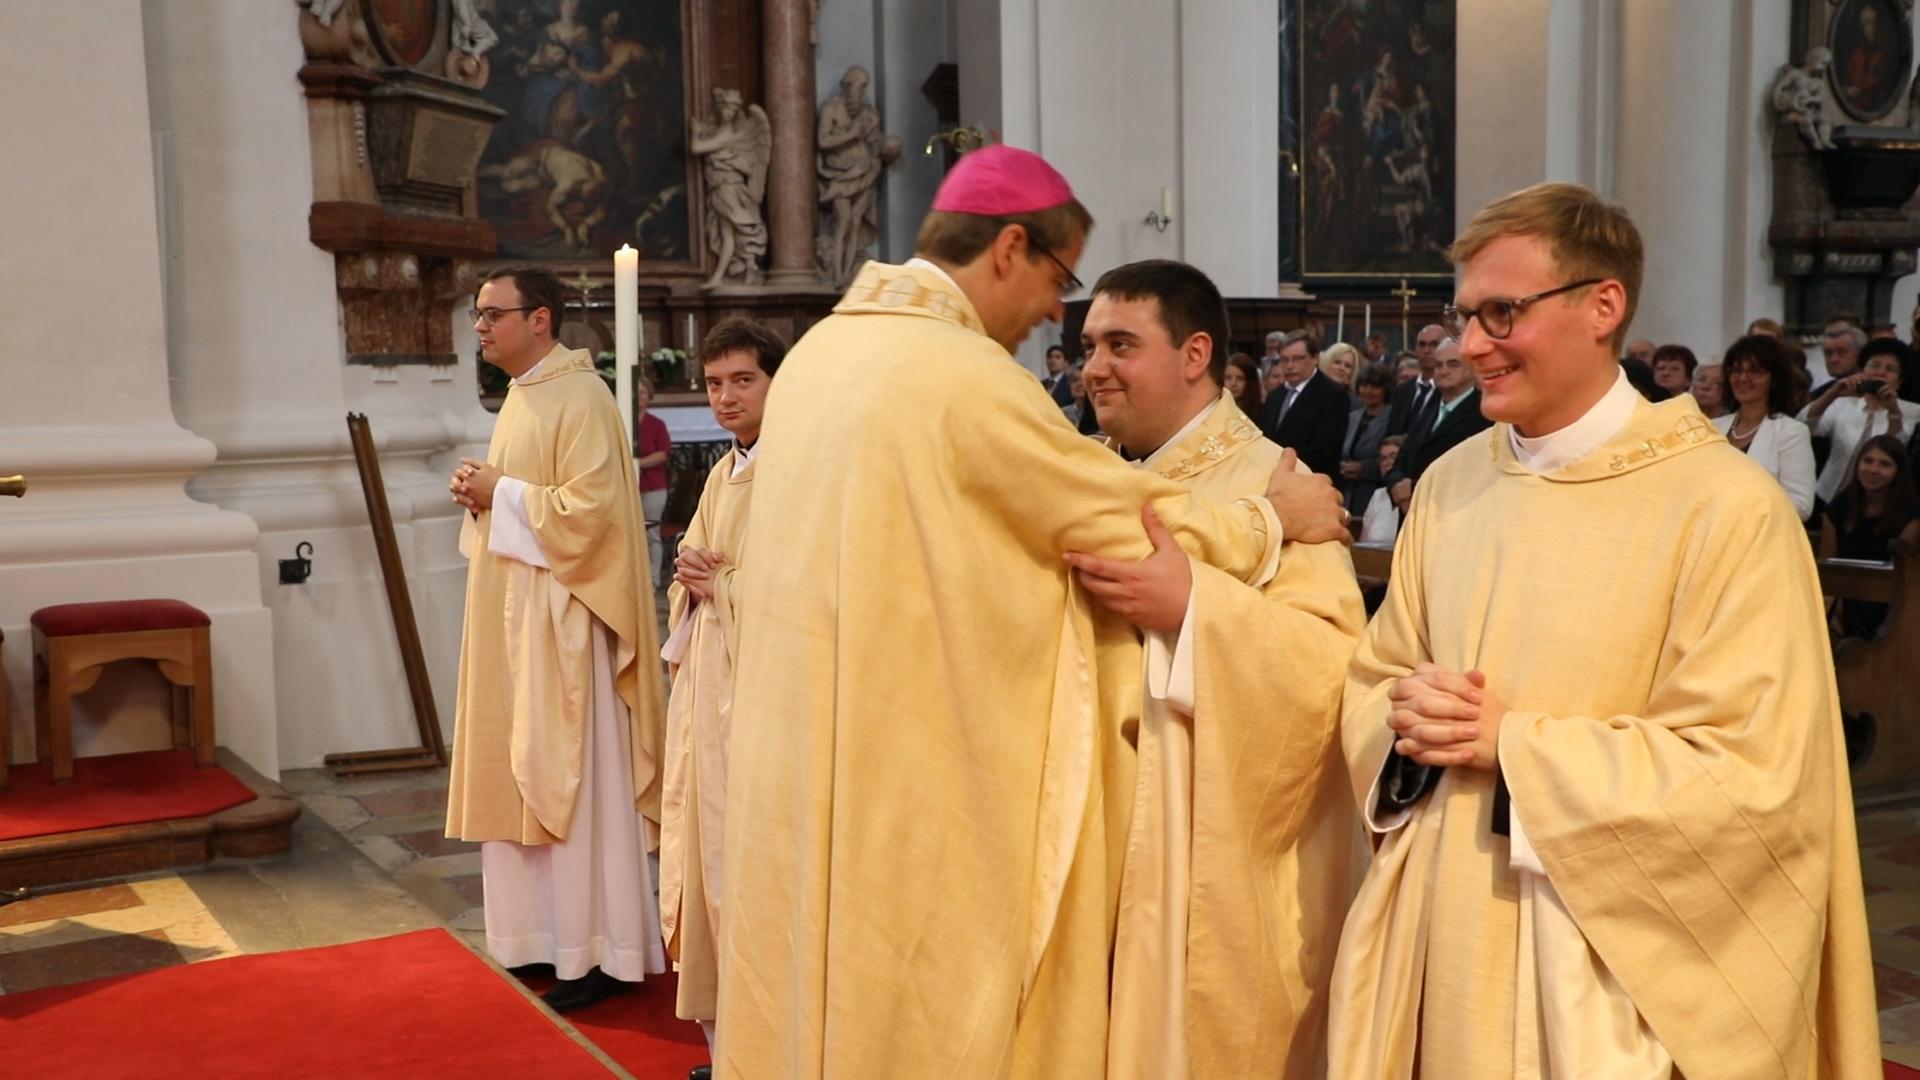 2018_06_News_Priesterweihe 300618 Title